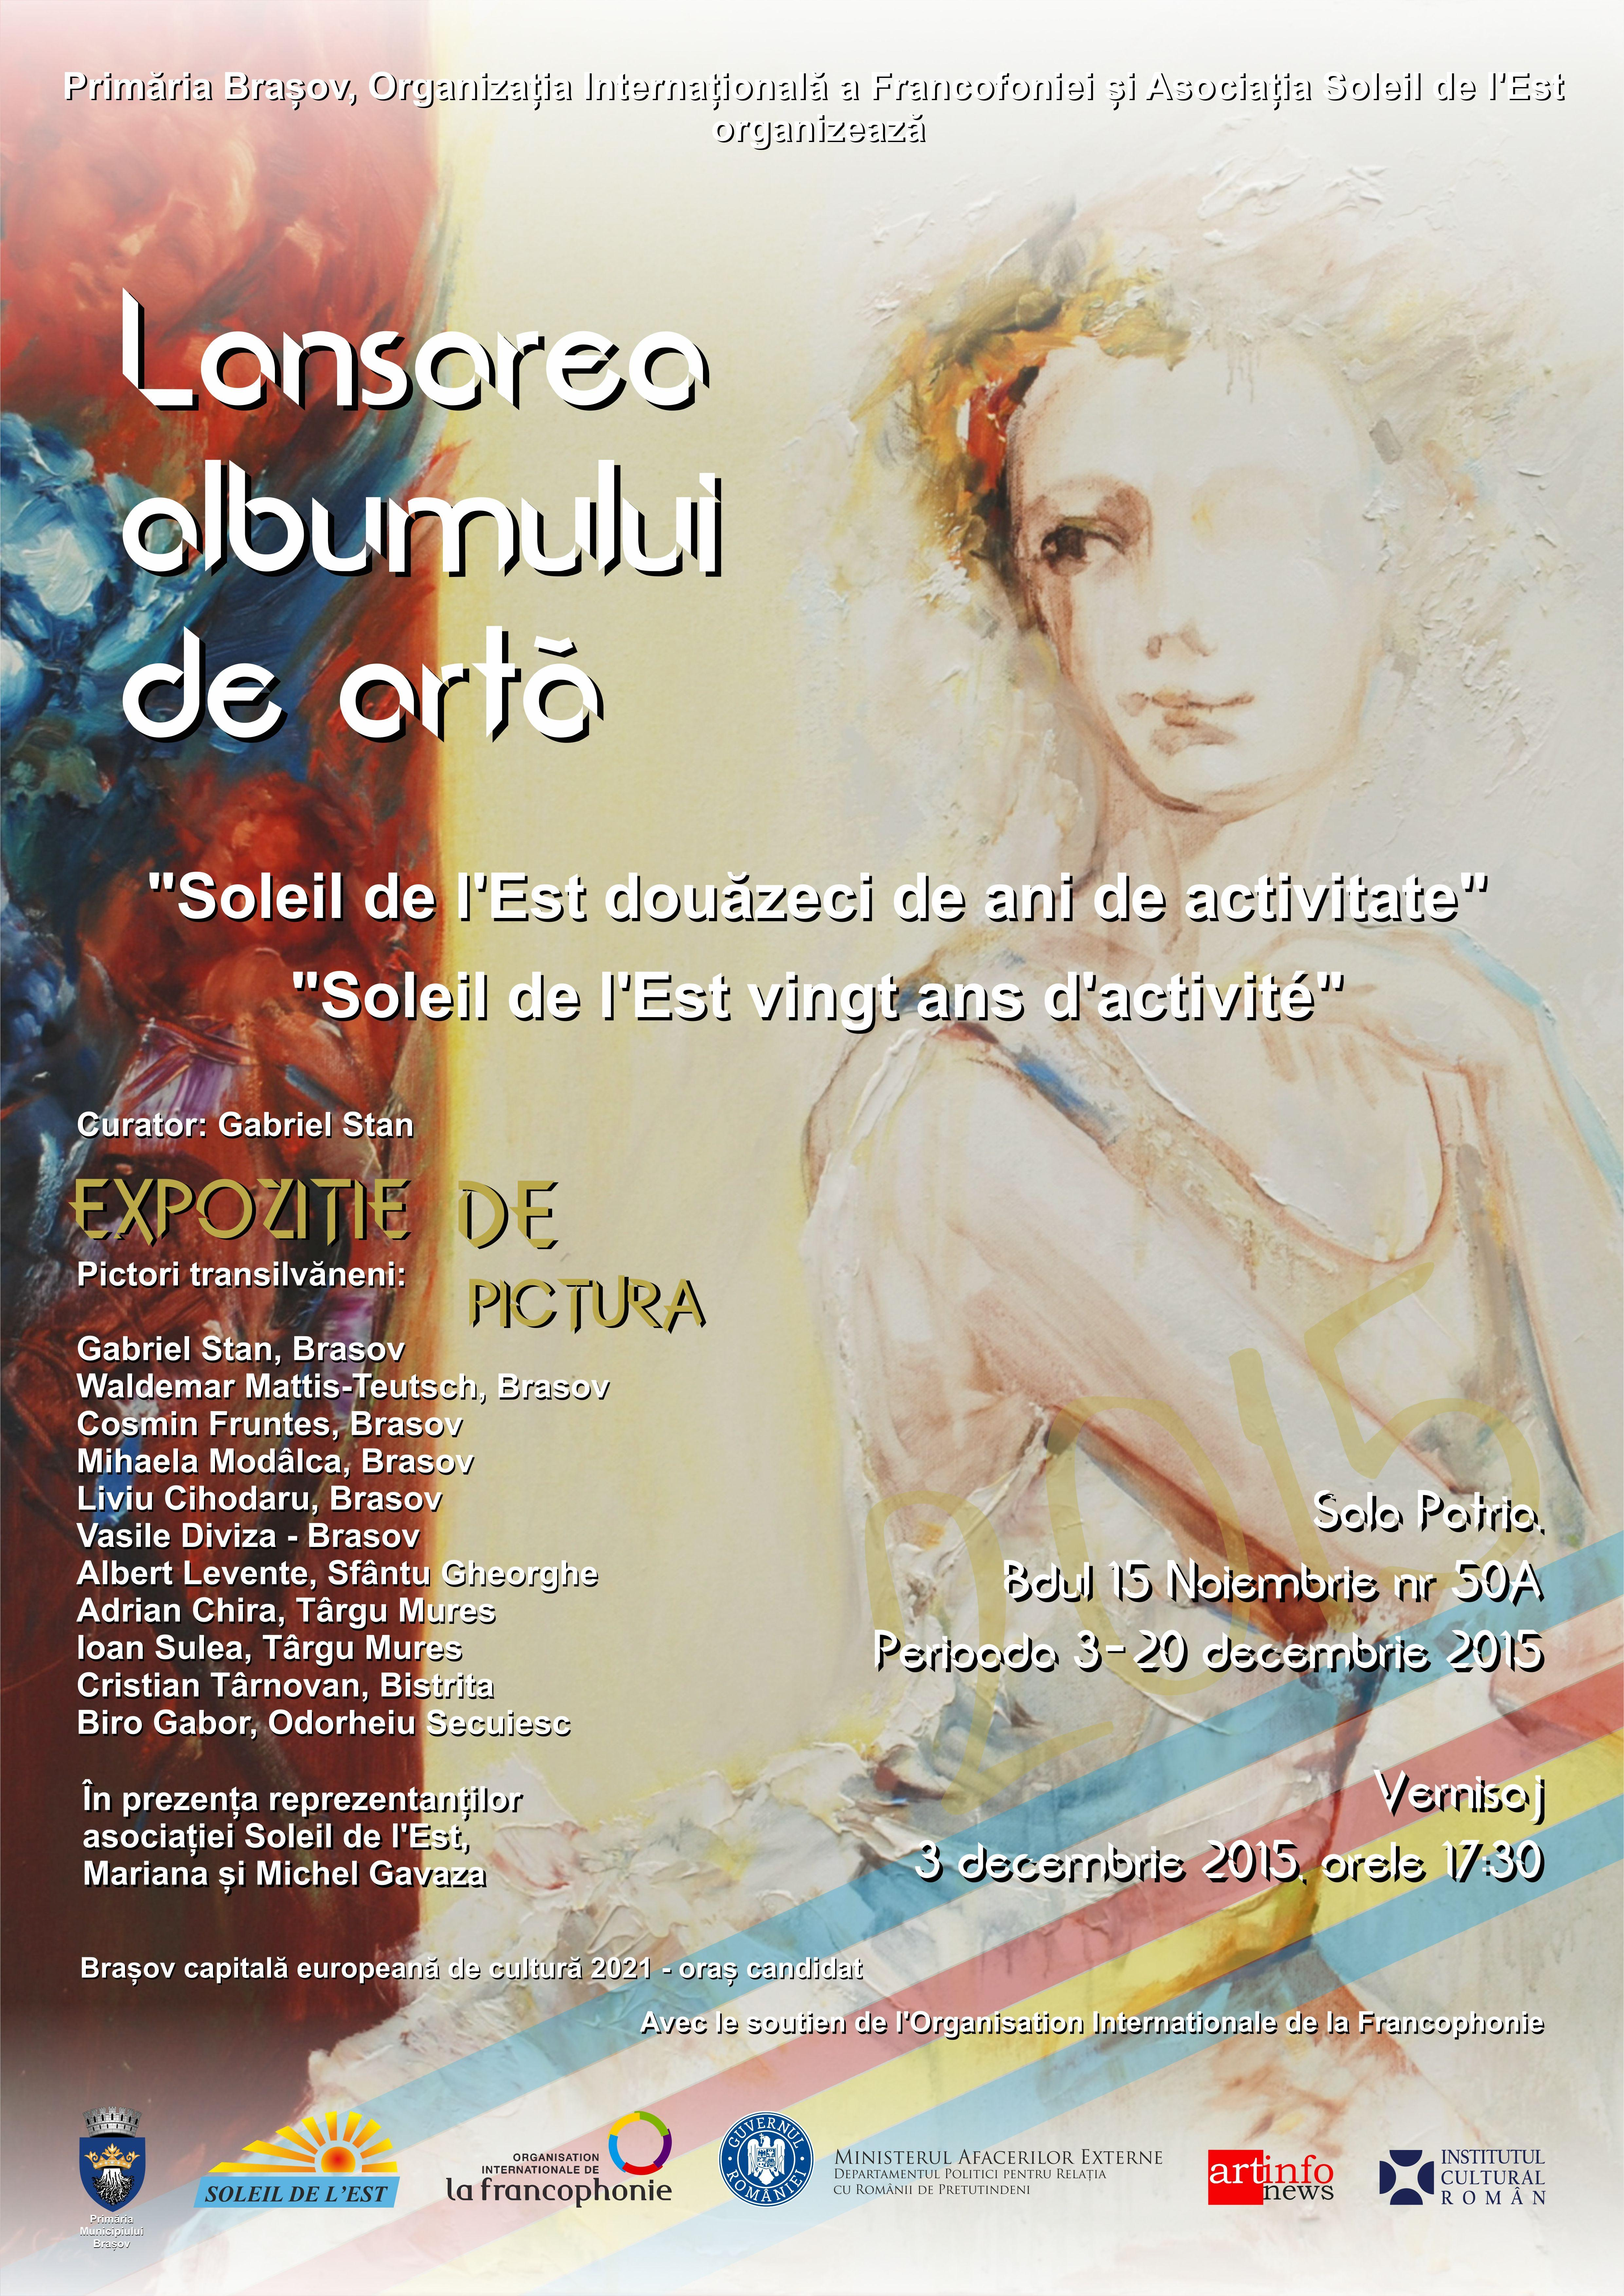 #brasov2021 | Vernisaj al pictorilor brasoveni | Soleil de l Est